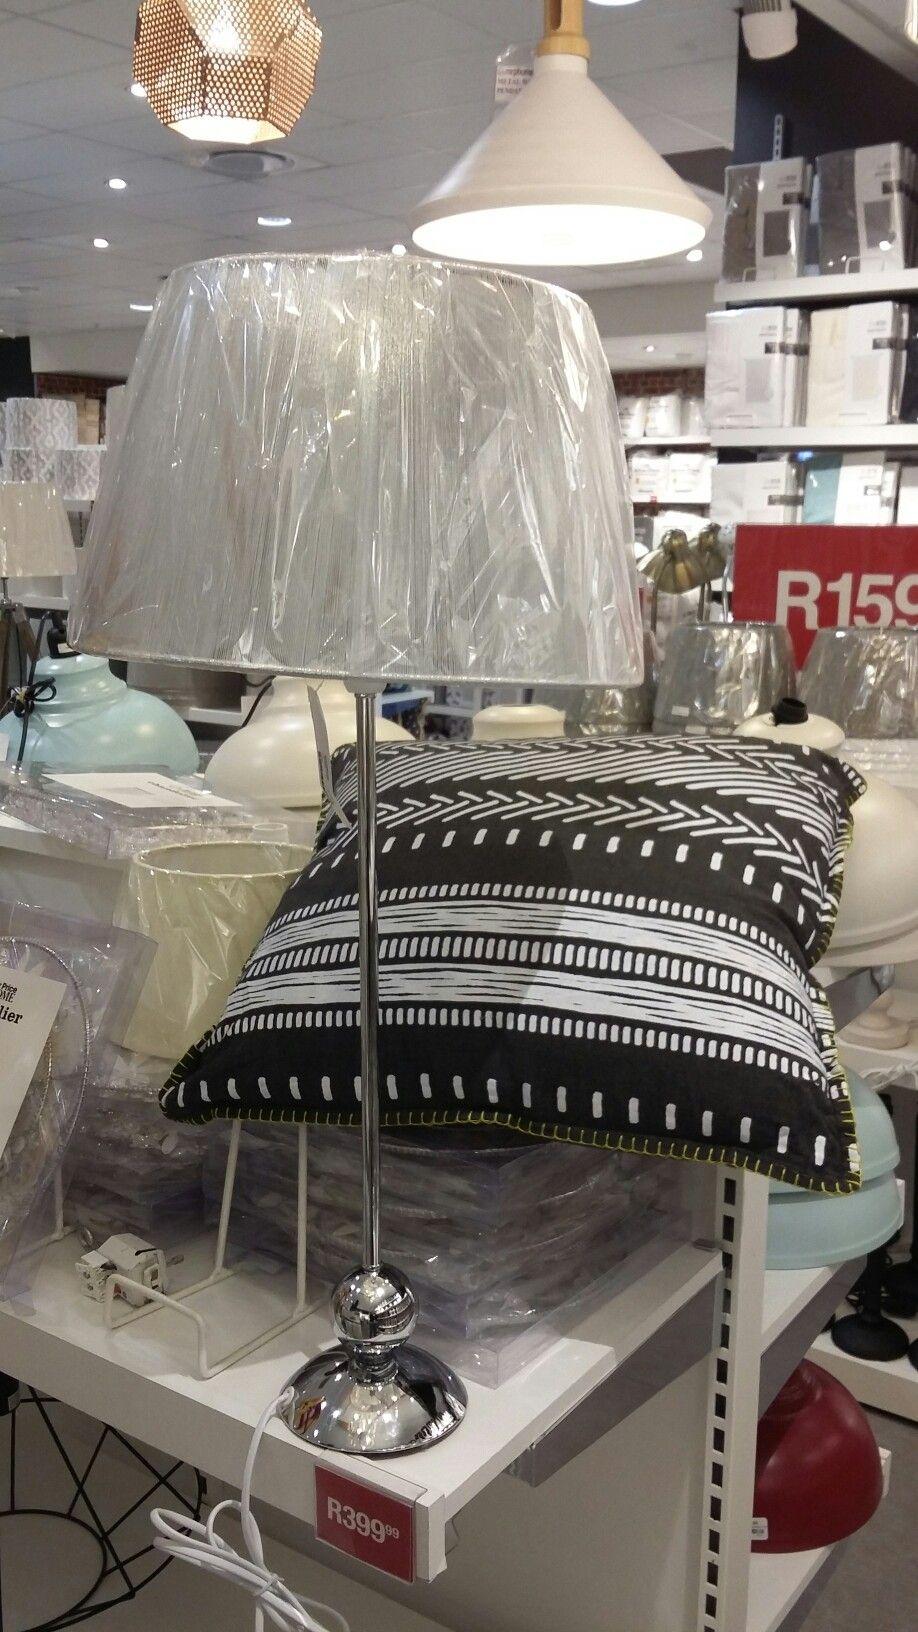 Mr mr mr mr price home catalogue 2014 - I Love Mr Price Home South Africa S Ikea